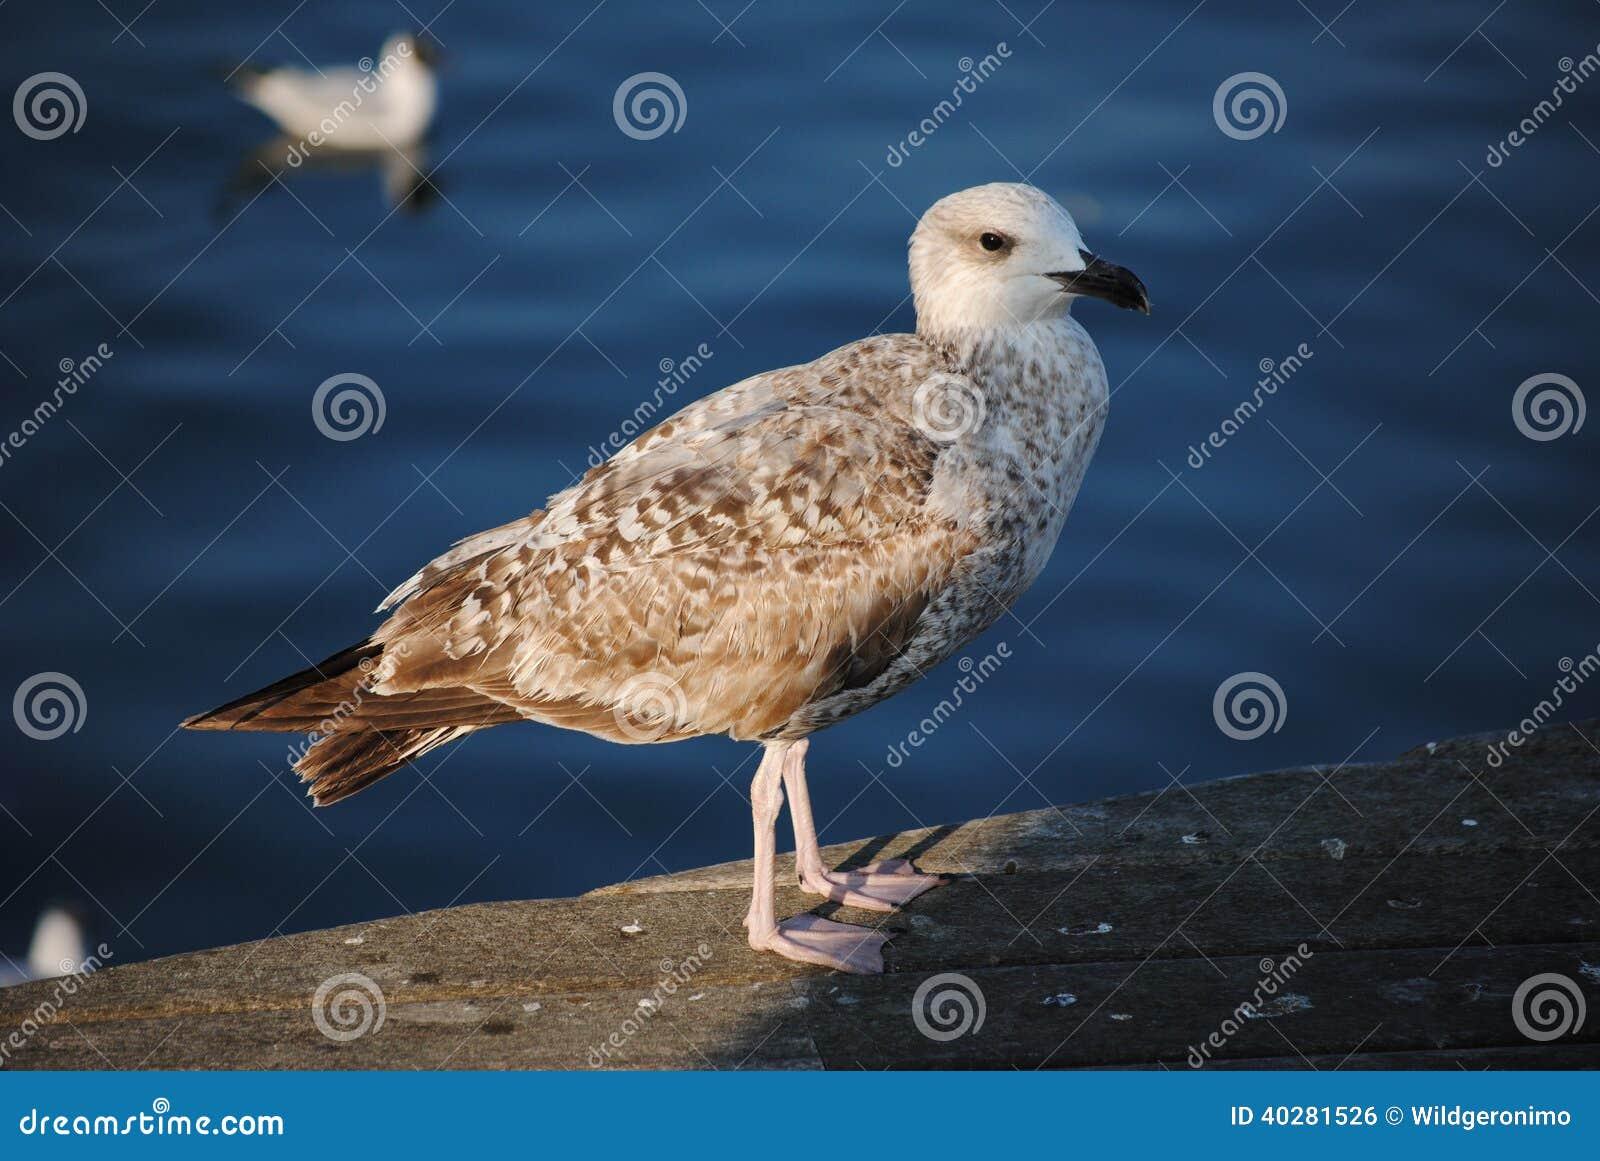 Подиум, чайка и море